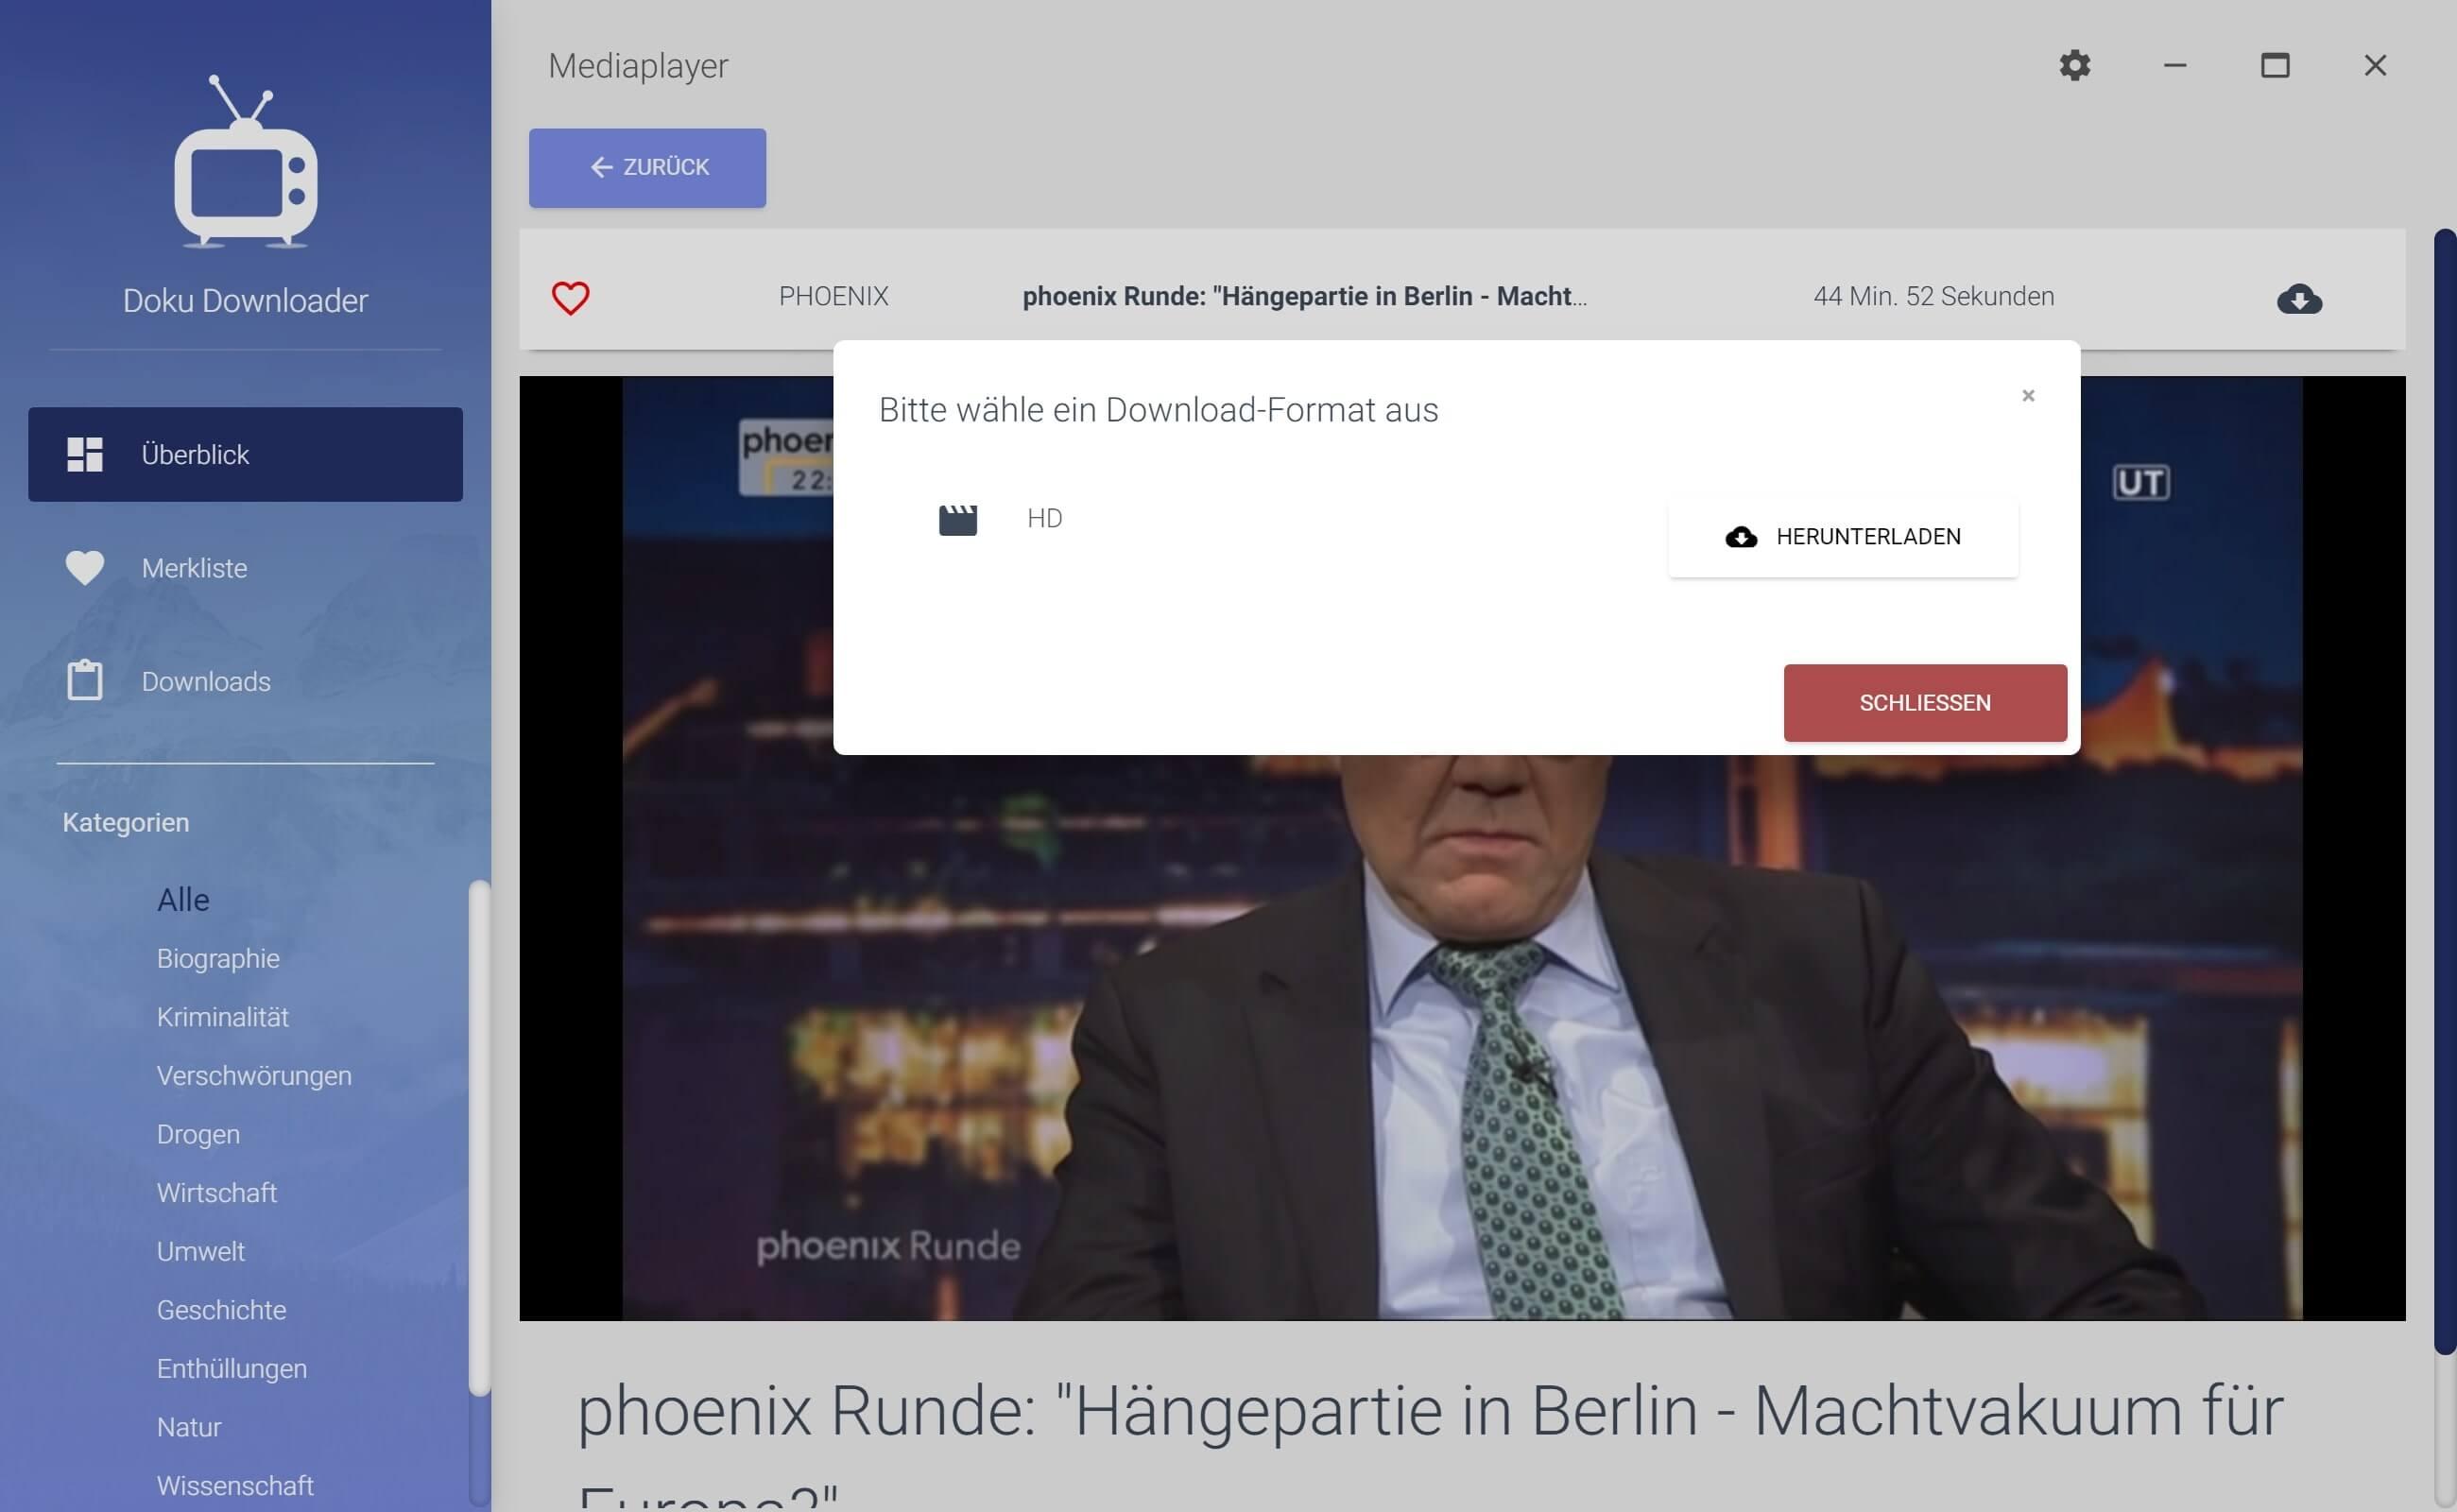 Phoenix Dokumentation aus Mediathek herunterladen - Downloadformat